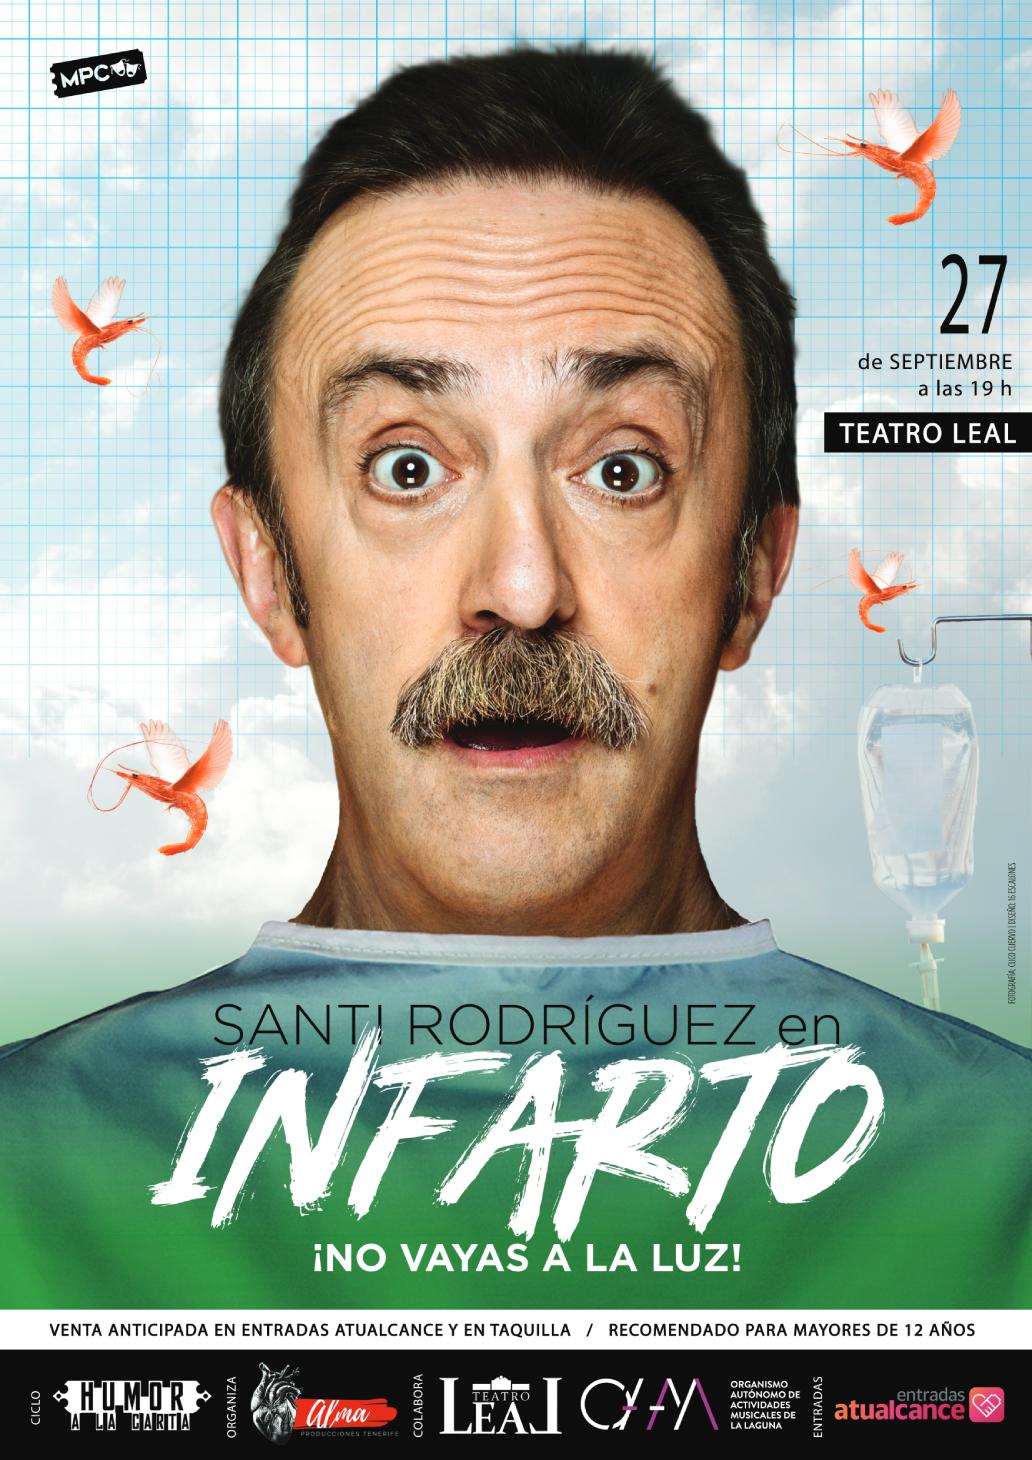 santi-rodriguez-infarto-5f4618a422dd7.jpeg